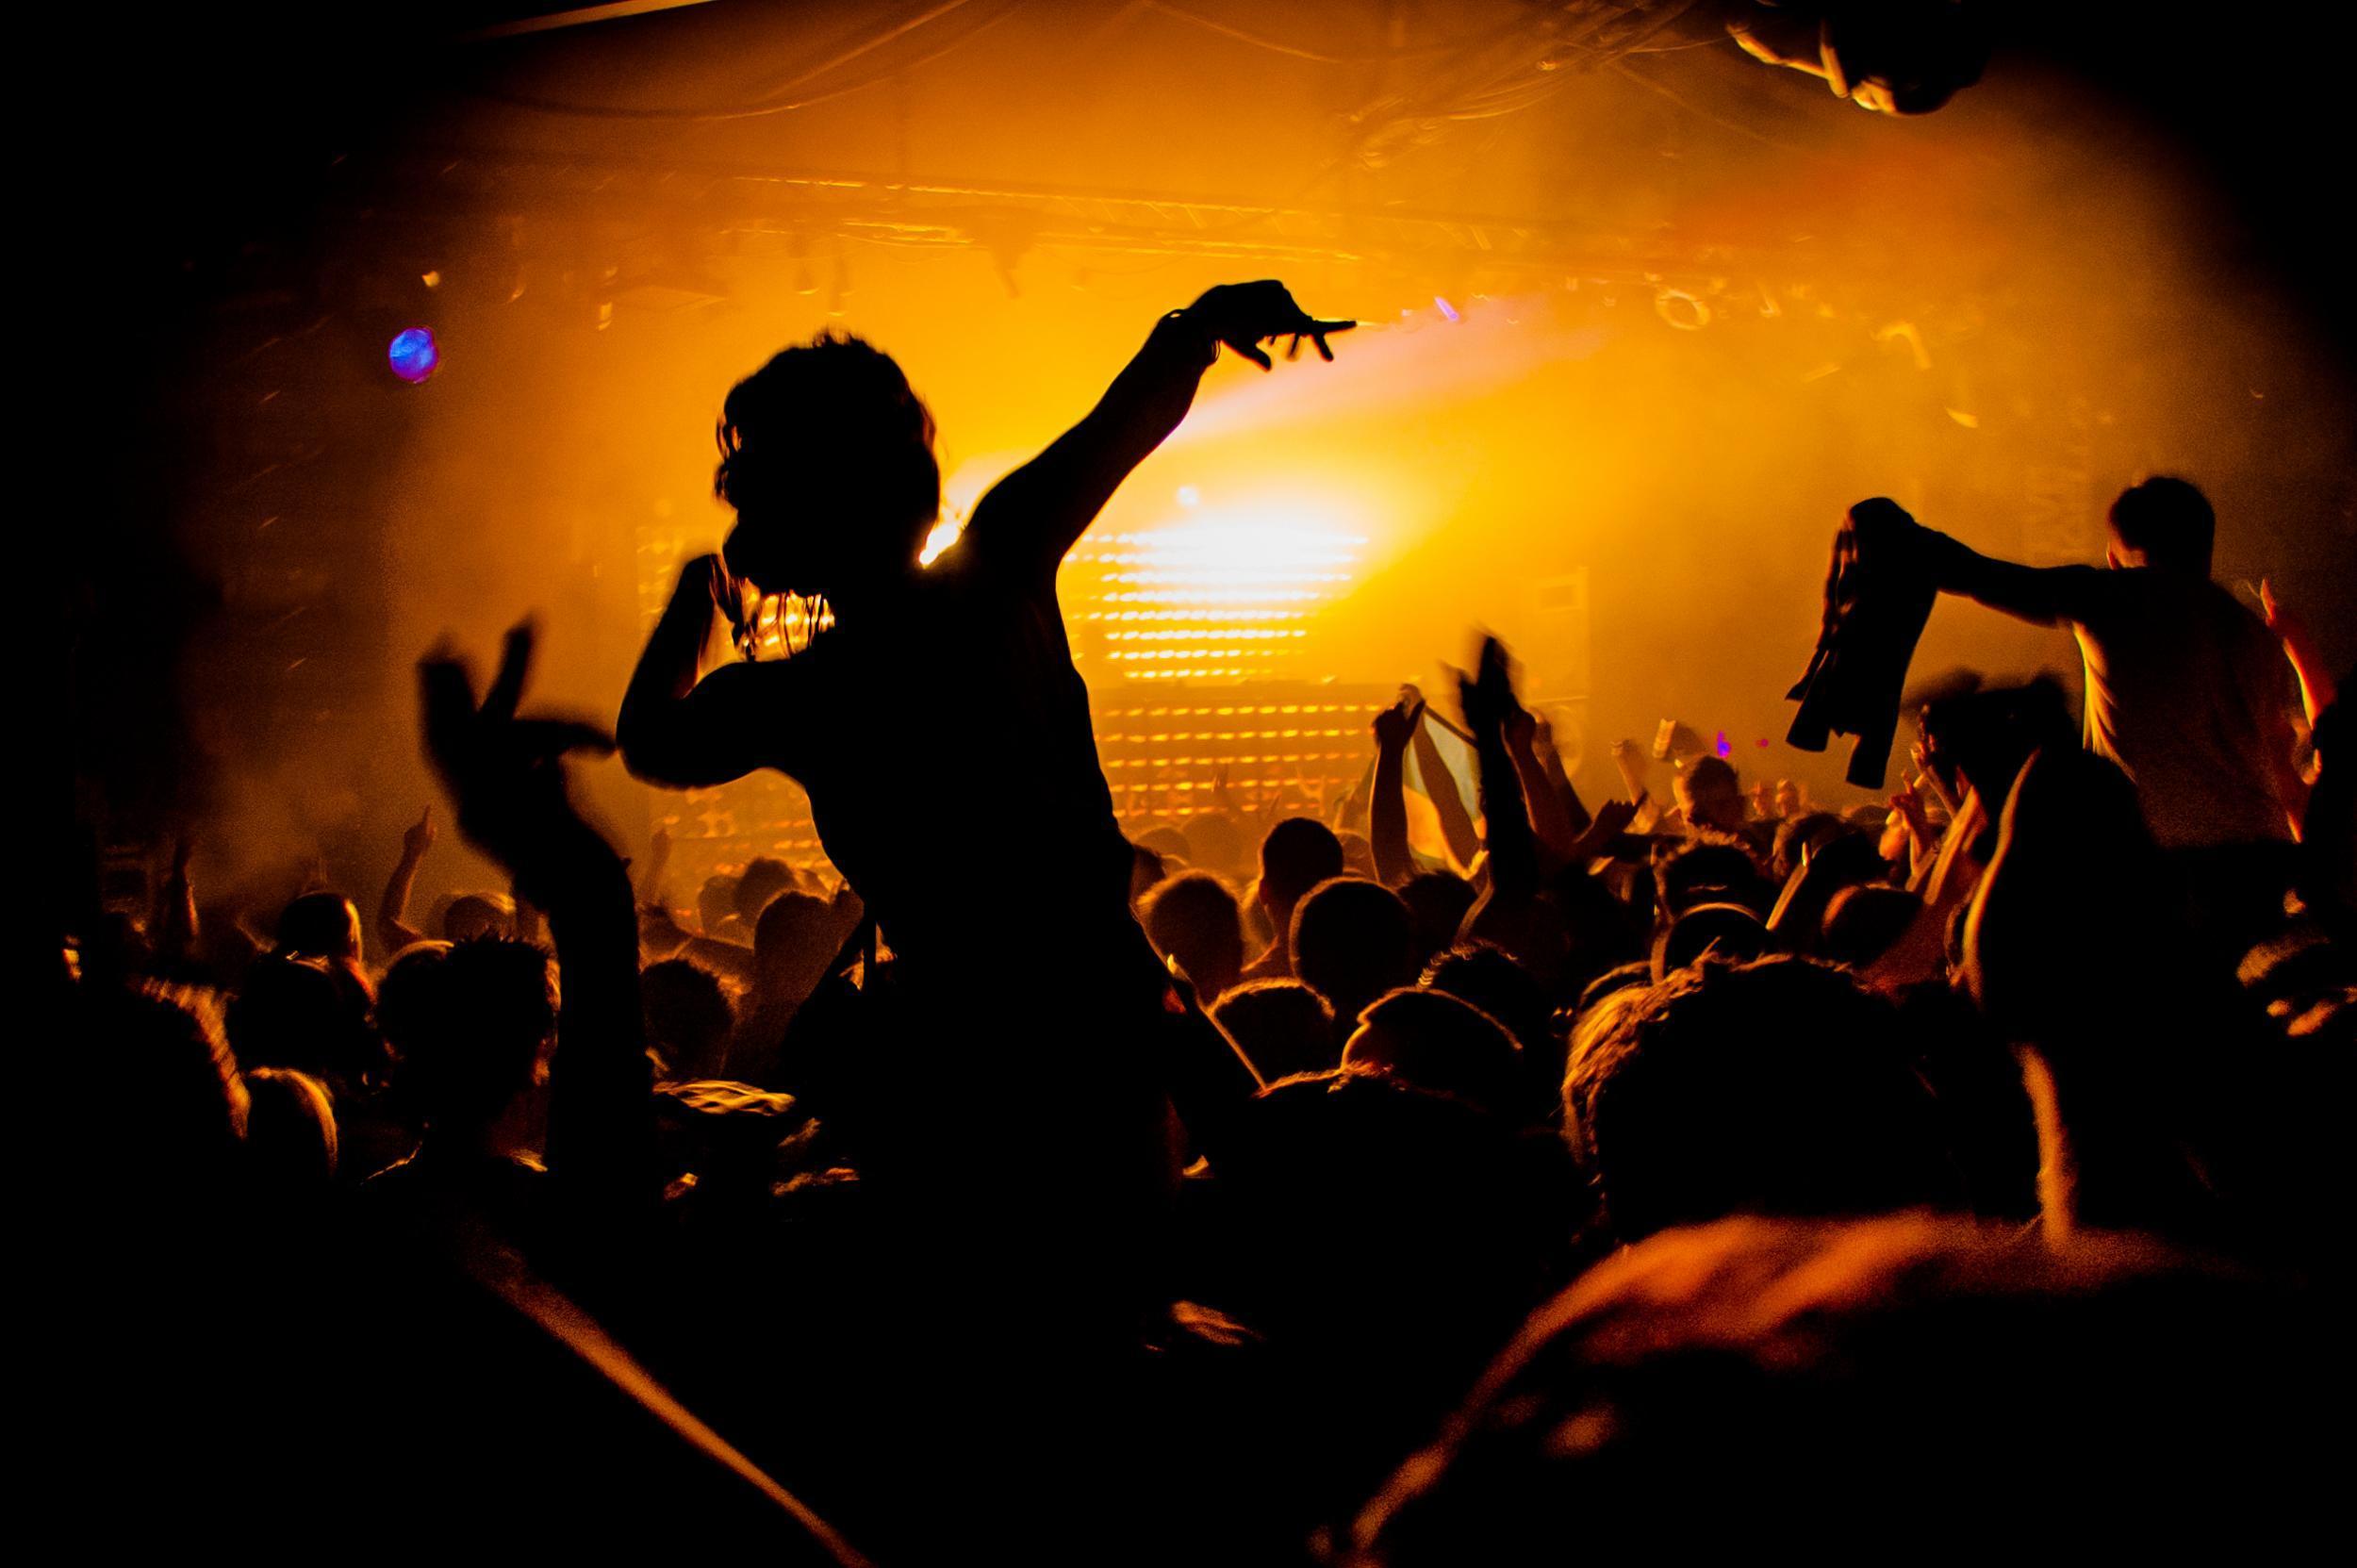 dancing club images - HD2500×1663